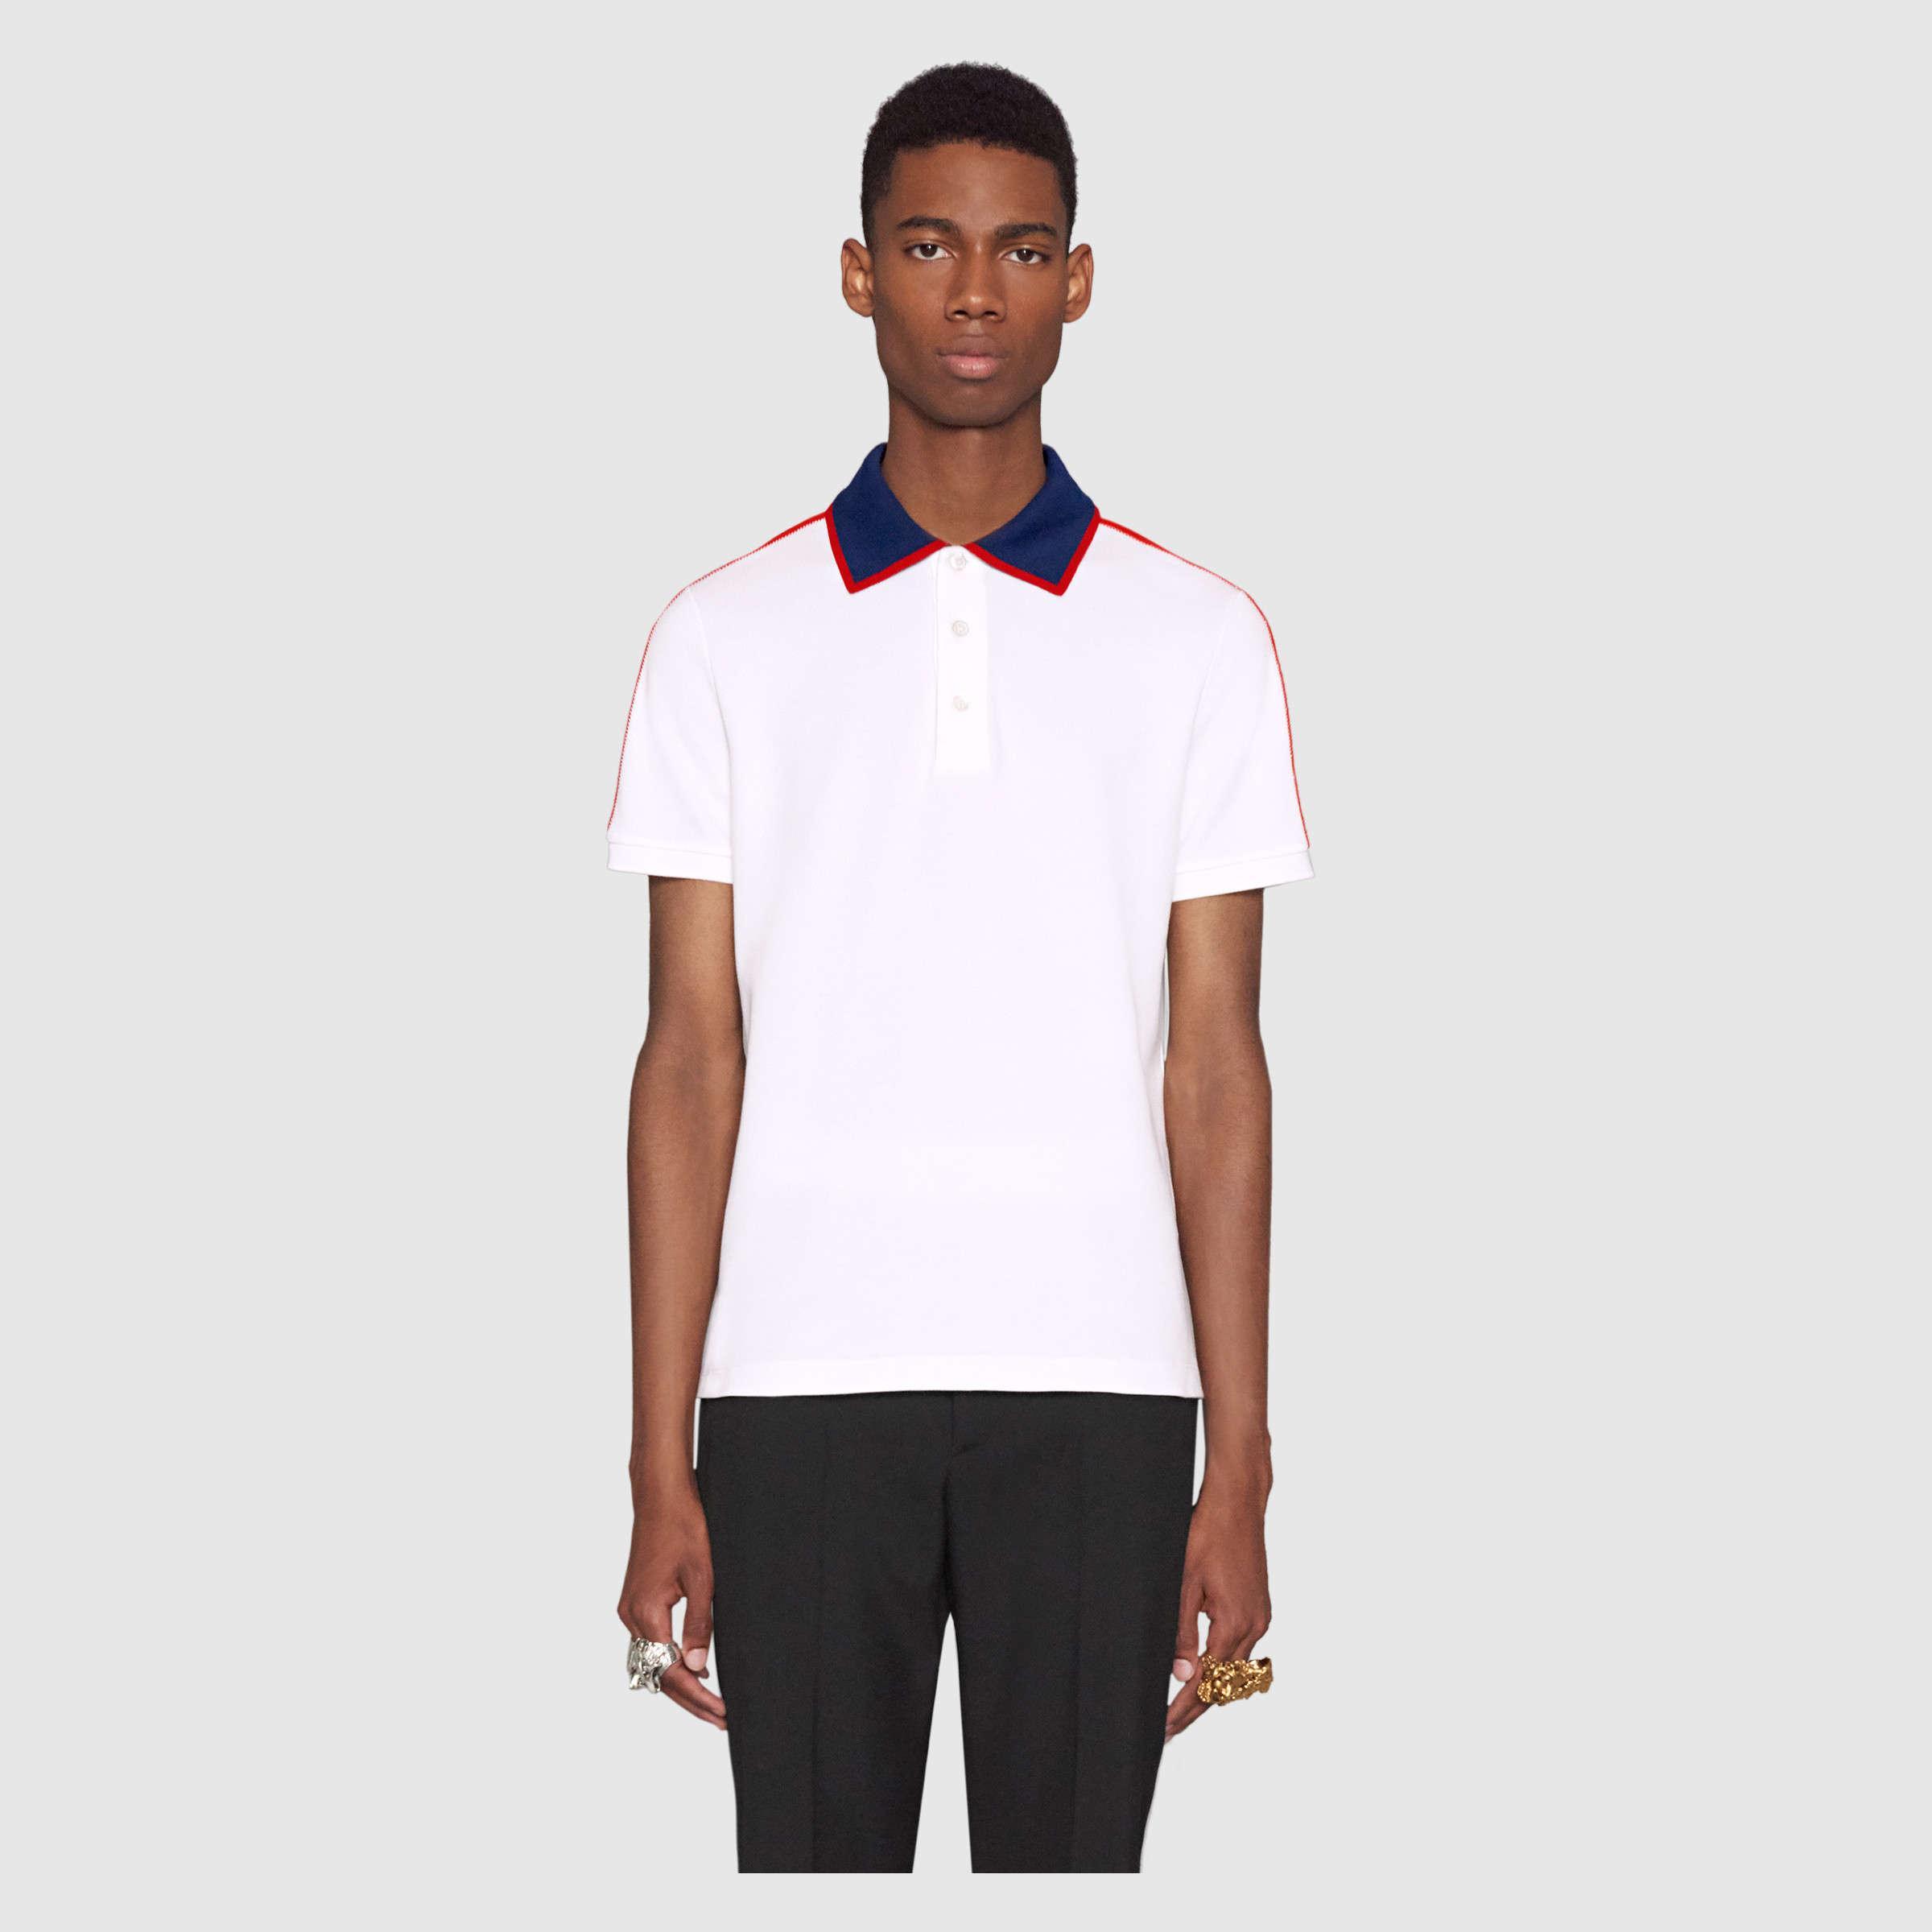 New Arrival Designer Polo Shirt Men And Women Shirt Casual Top Tees ... cdbd313552220